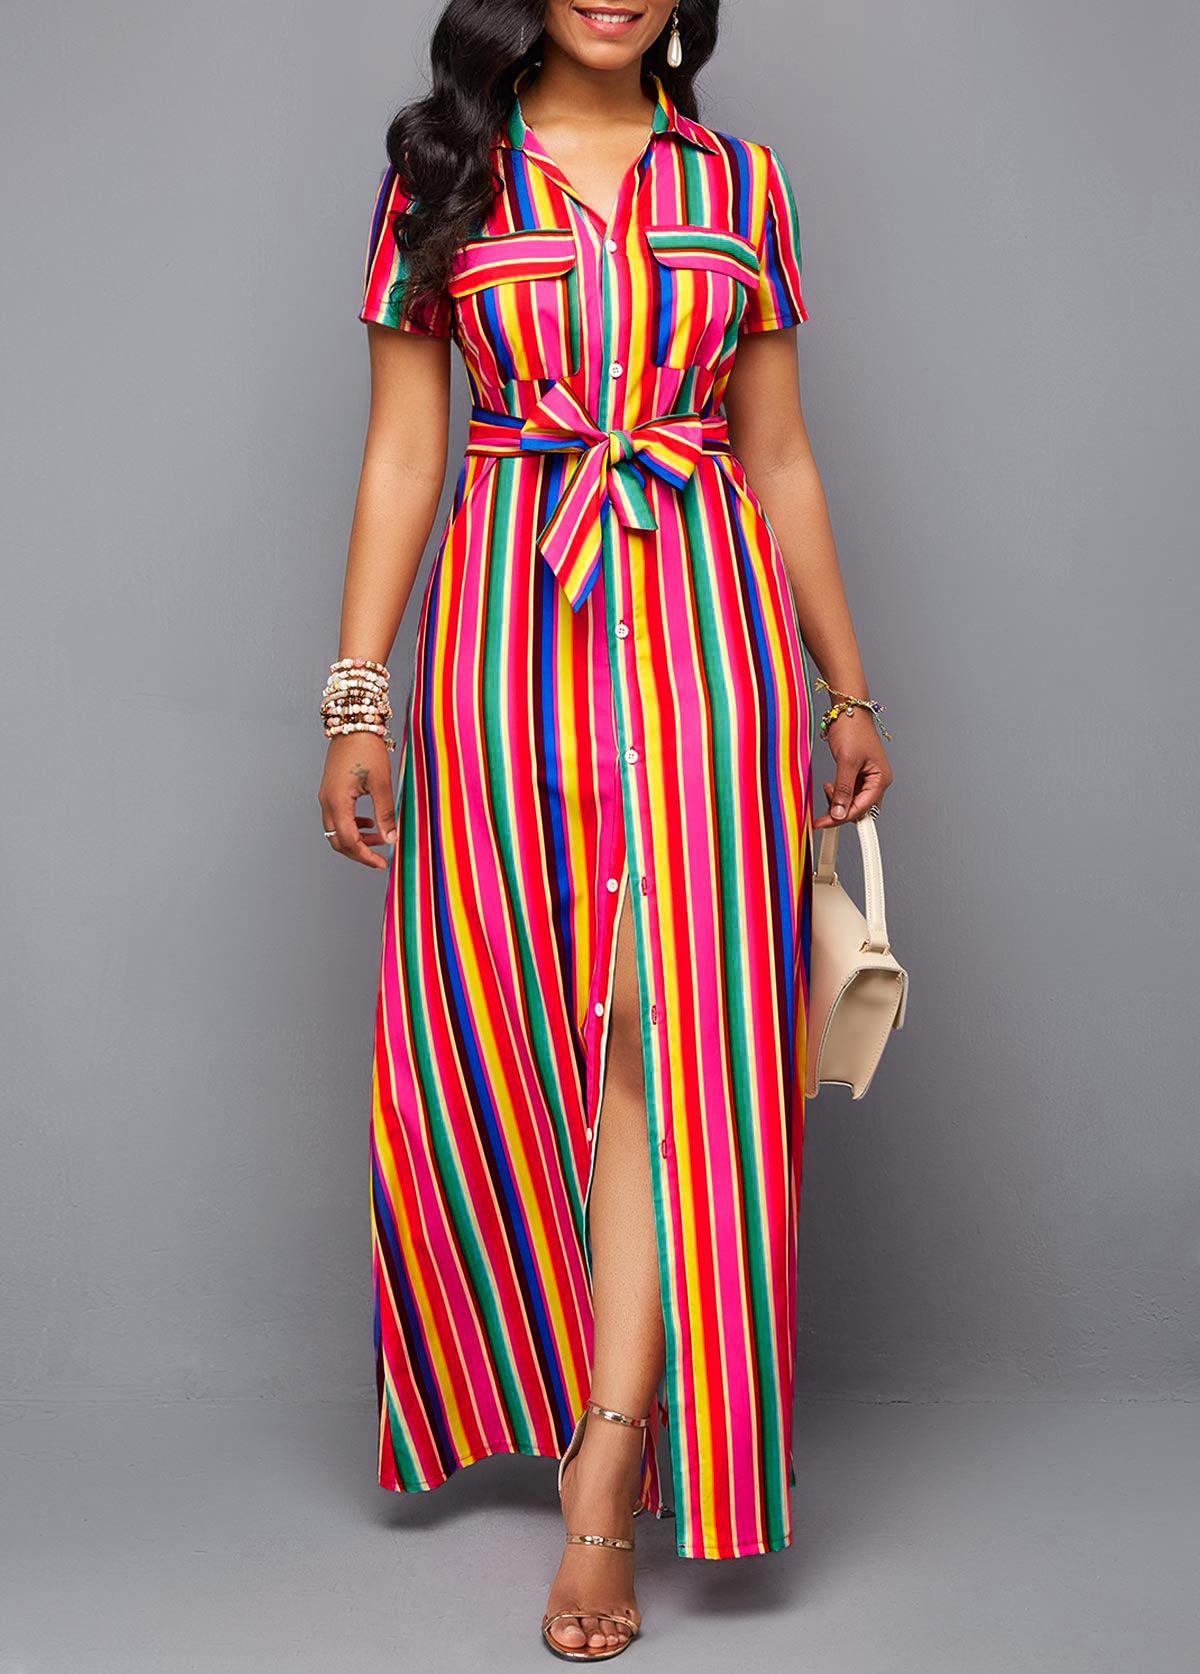 Belted Turndown Collar Button Up Rainbow Color Dress Rosewe Com Usd 38 73 Maxi Shirt Dress Shop Casual Dresses Button Up Maxi Dress [ 1674 x 1200 Pixel ]